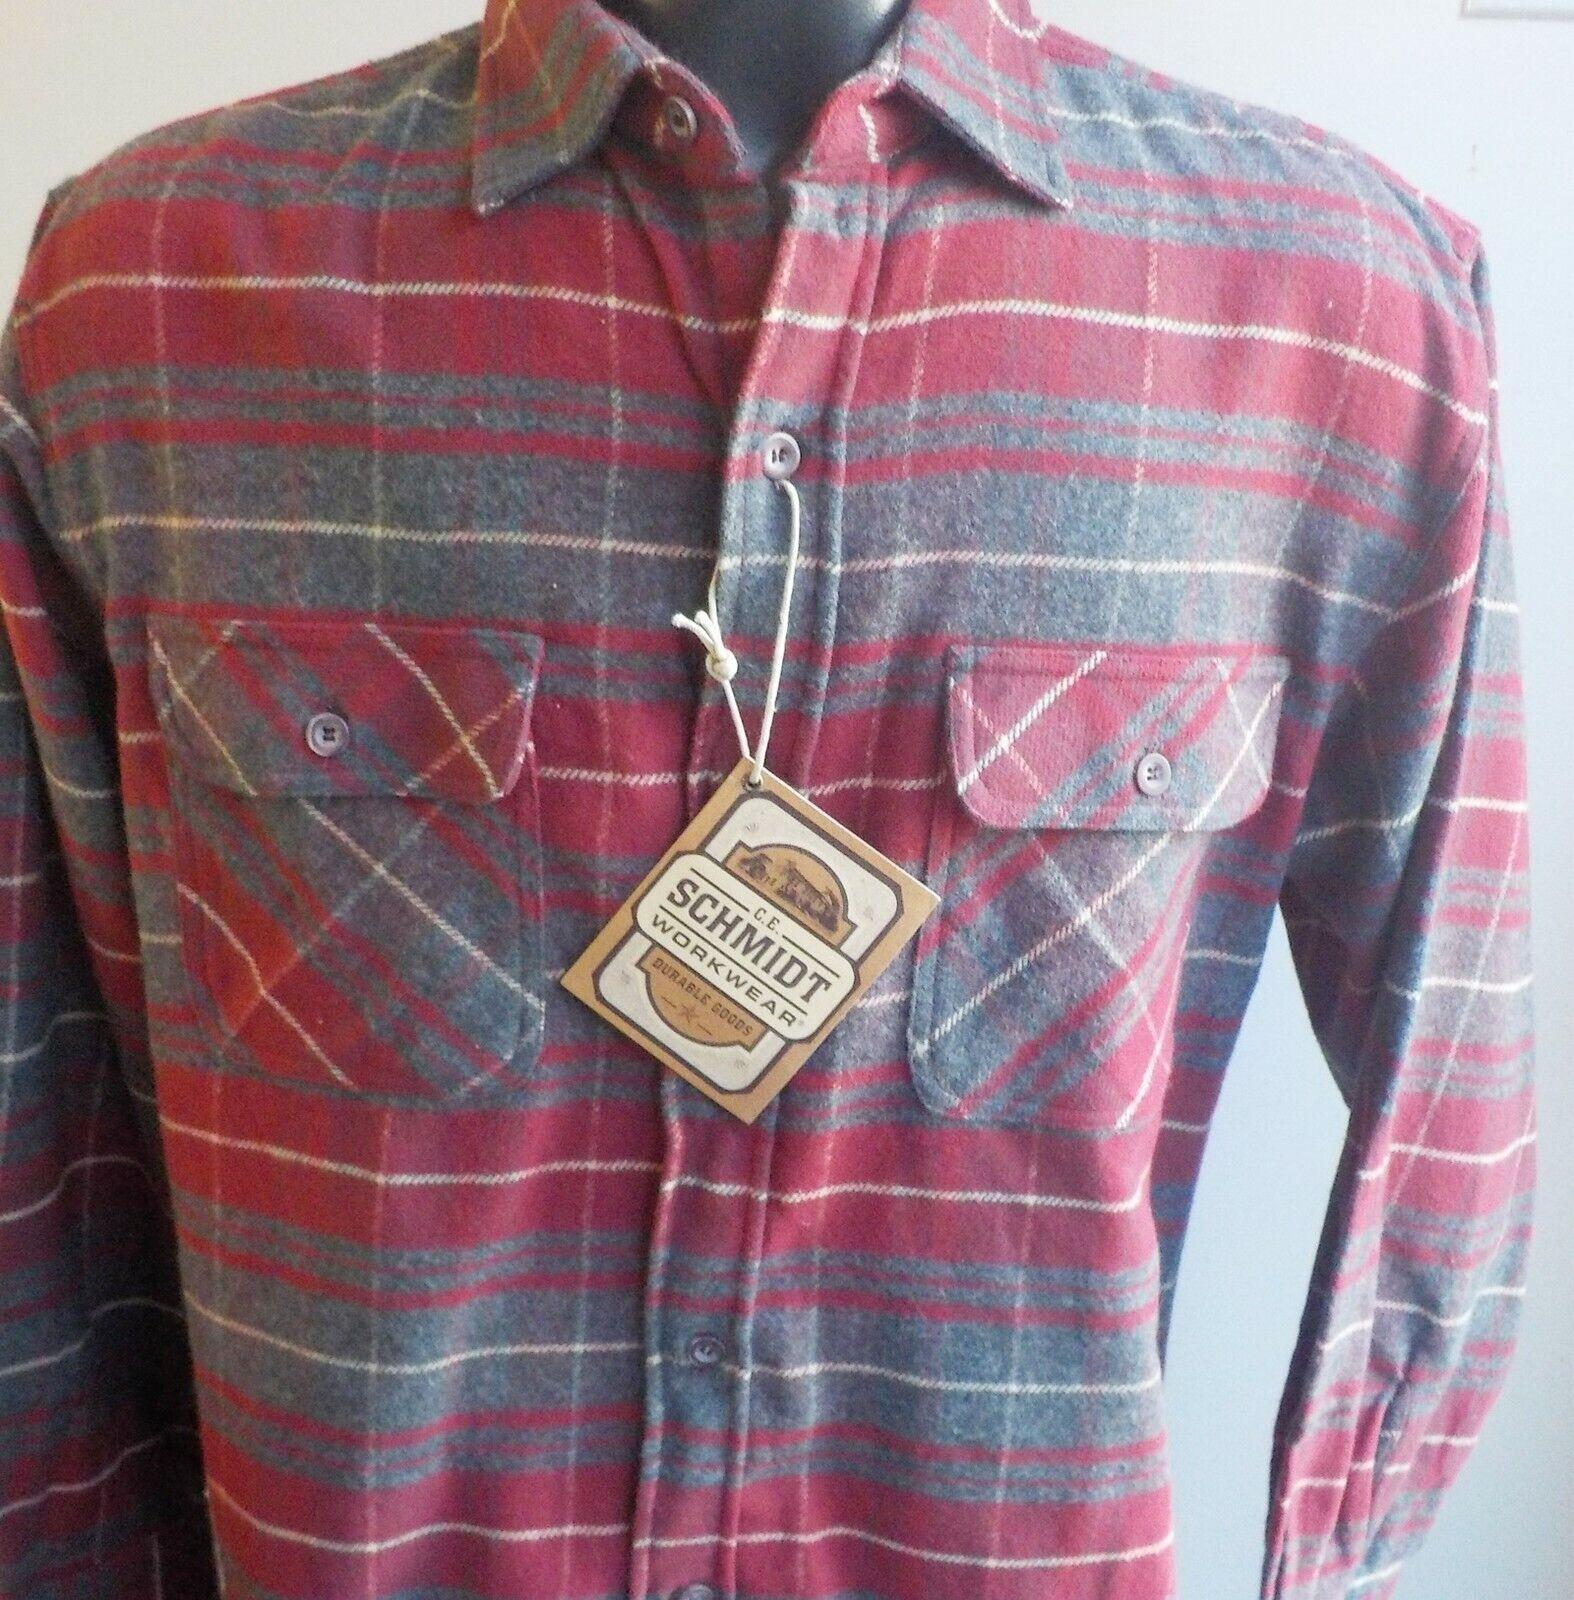 c869d7453 E Schmidt Workwear Plaid Sleeve Heavy Cotton Shirt Red Medium Long C  nygxyh4594-Casual Button-Down Shirts